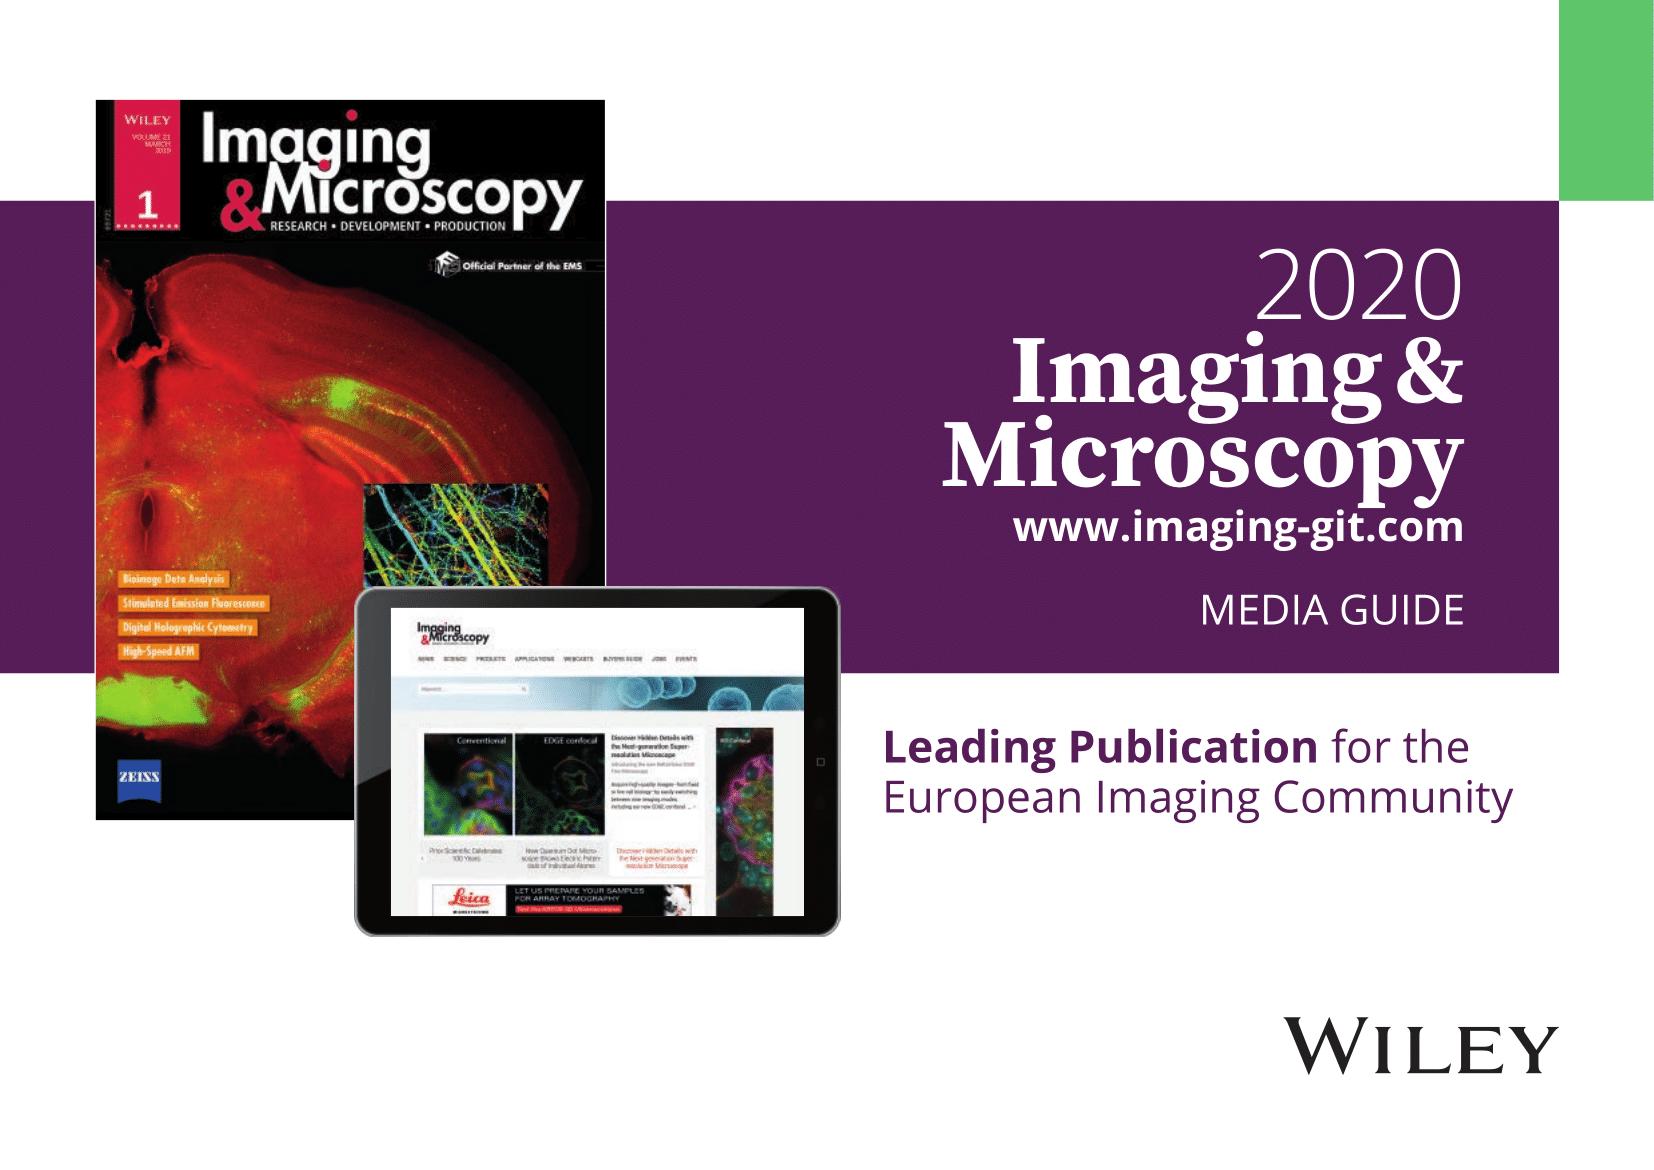 Imaging & Microscopy